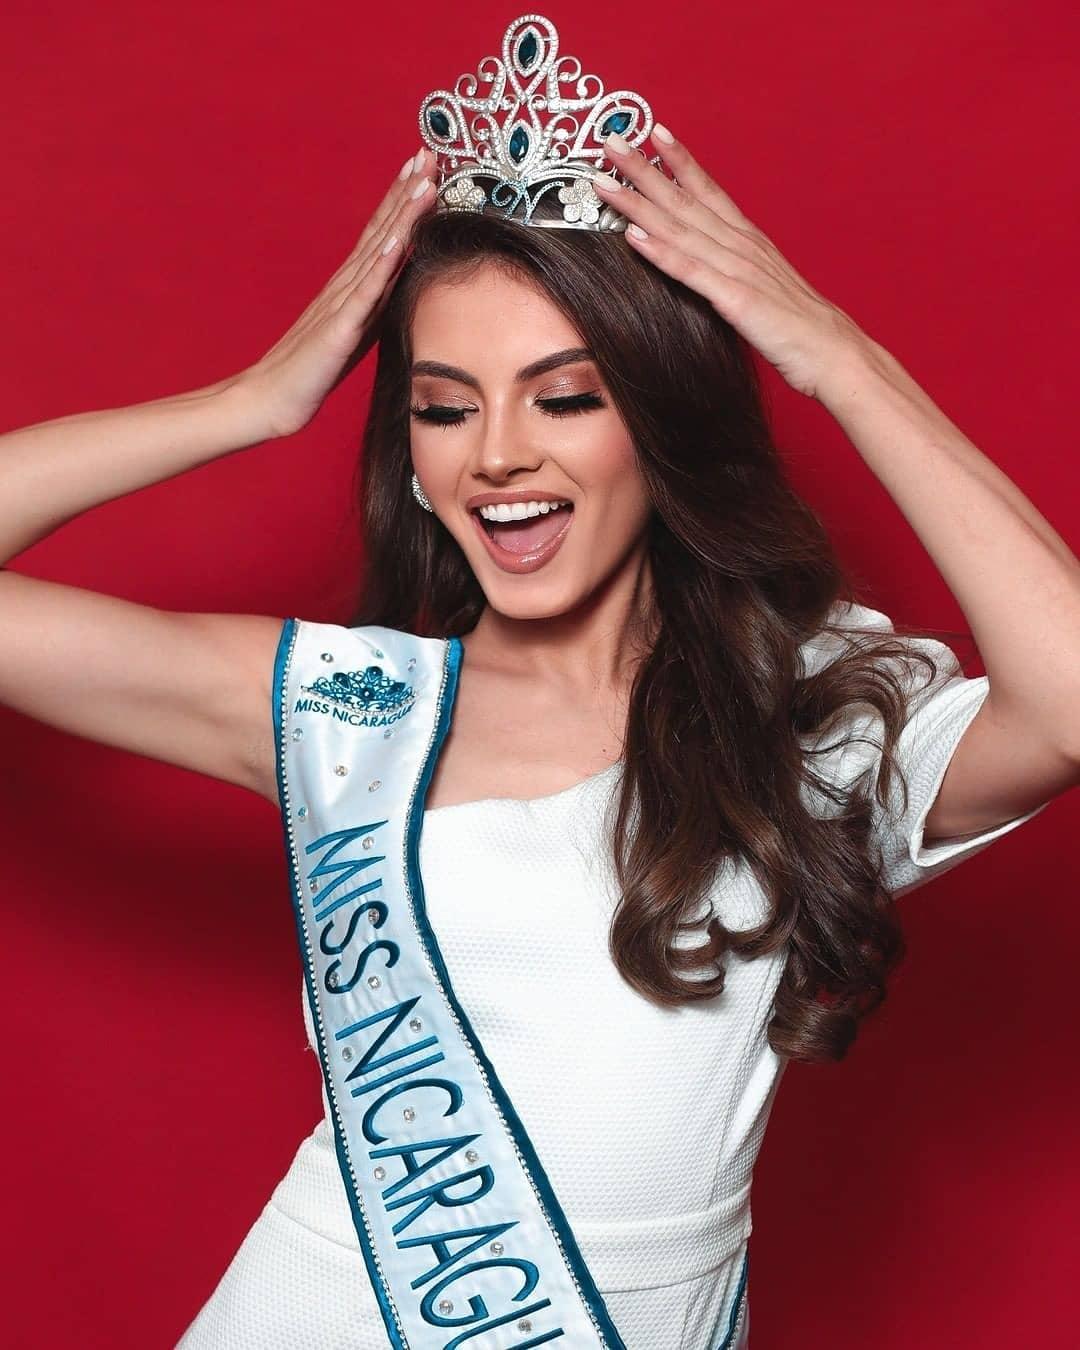 official de miss nicaragua 2020. UDnYPk